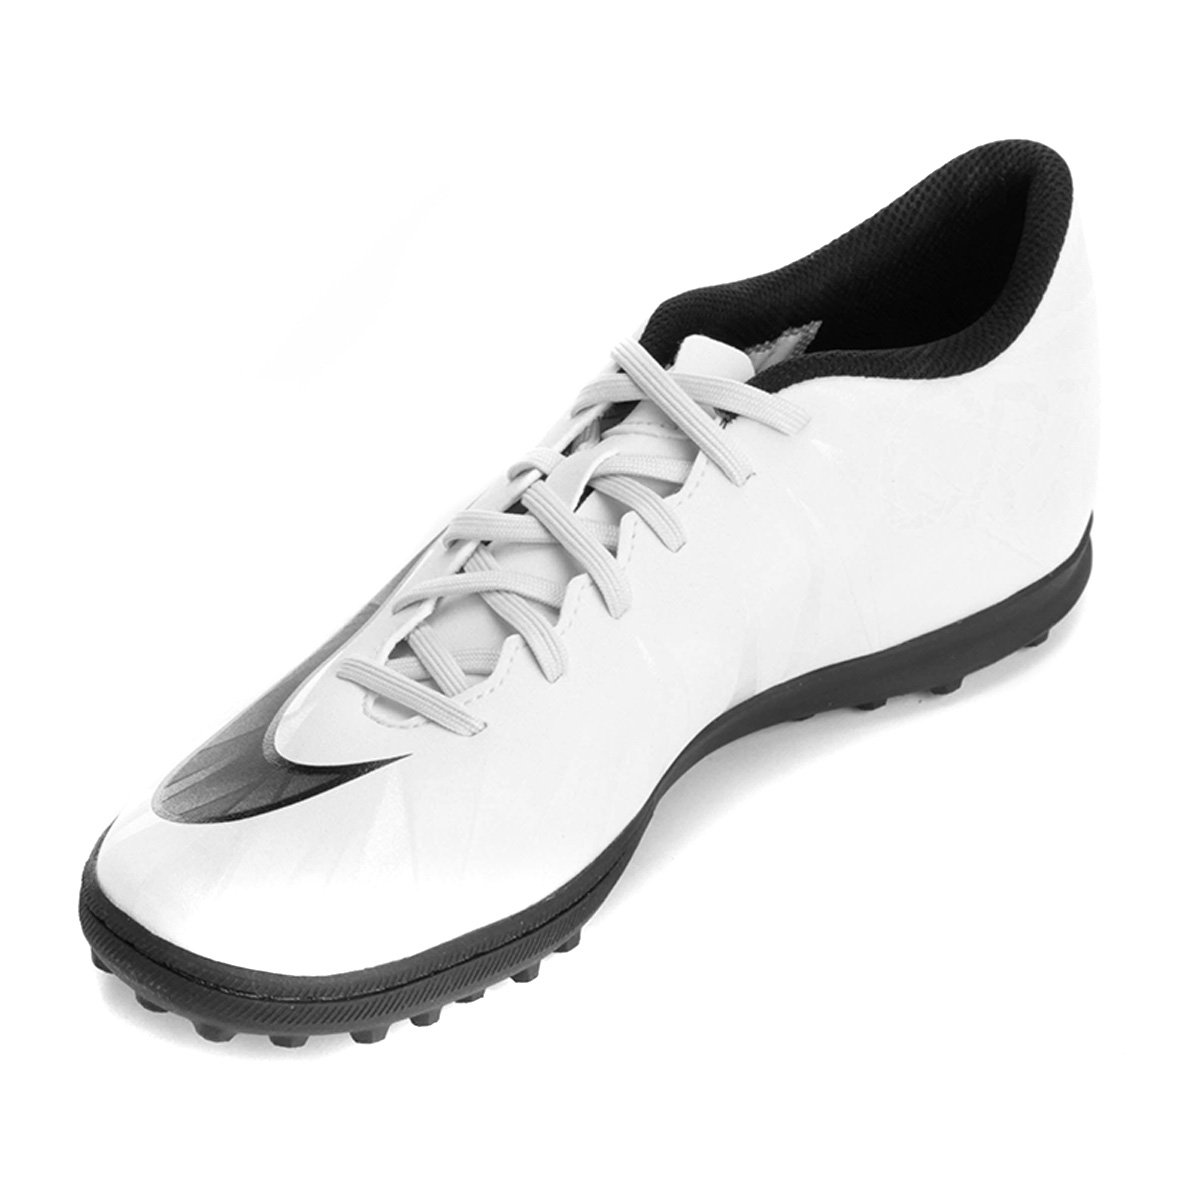 f3702a6d96 Chuteira Society Nike Mercurial X Vortex 3 CR7 TF - Compre Agora ...